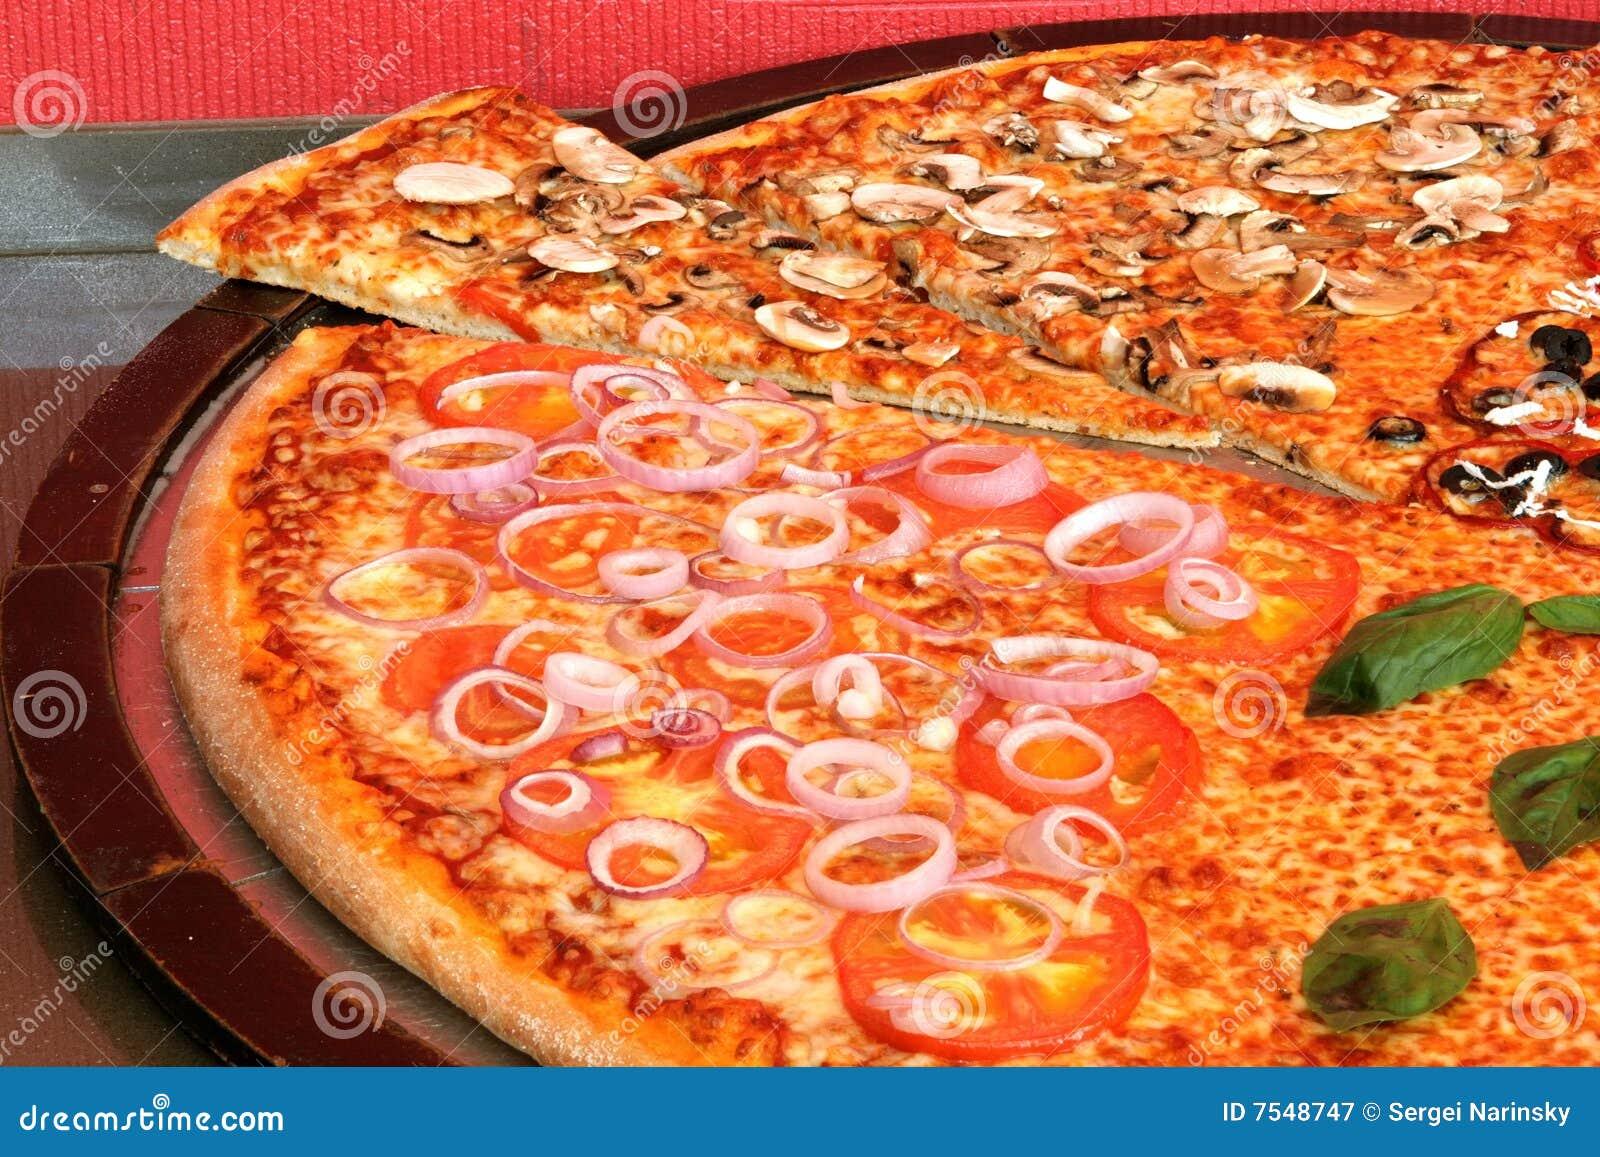 Big pizza royalty free stock photography image 7548747 for Mundo pizza la algaba